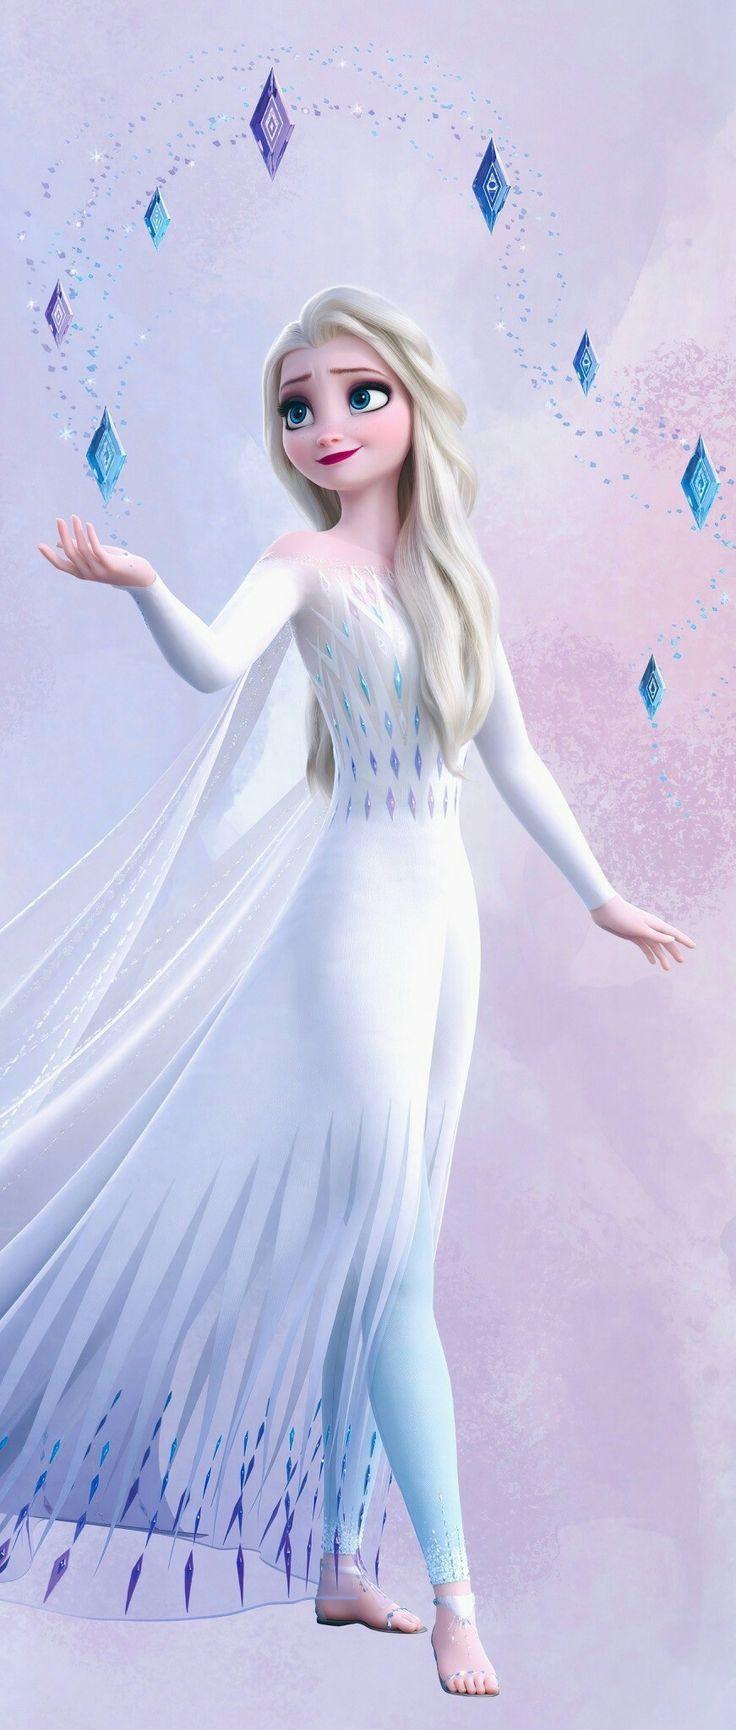 Pin By Mia On Elsa Fifth Spirit In 2020 Disney Princess Frozen Wallpaper Iphone Disney Princess Disney Princess Pictures